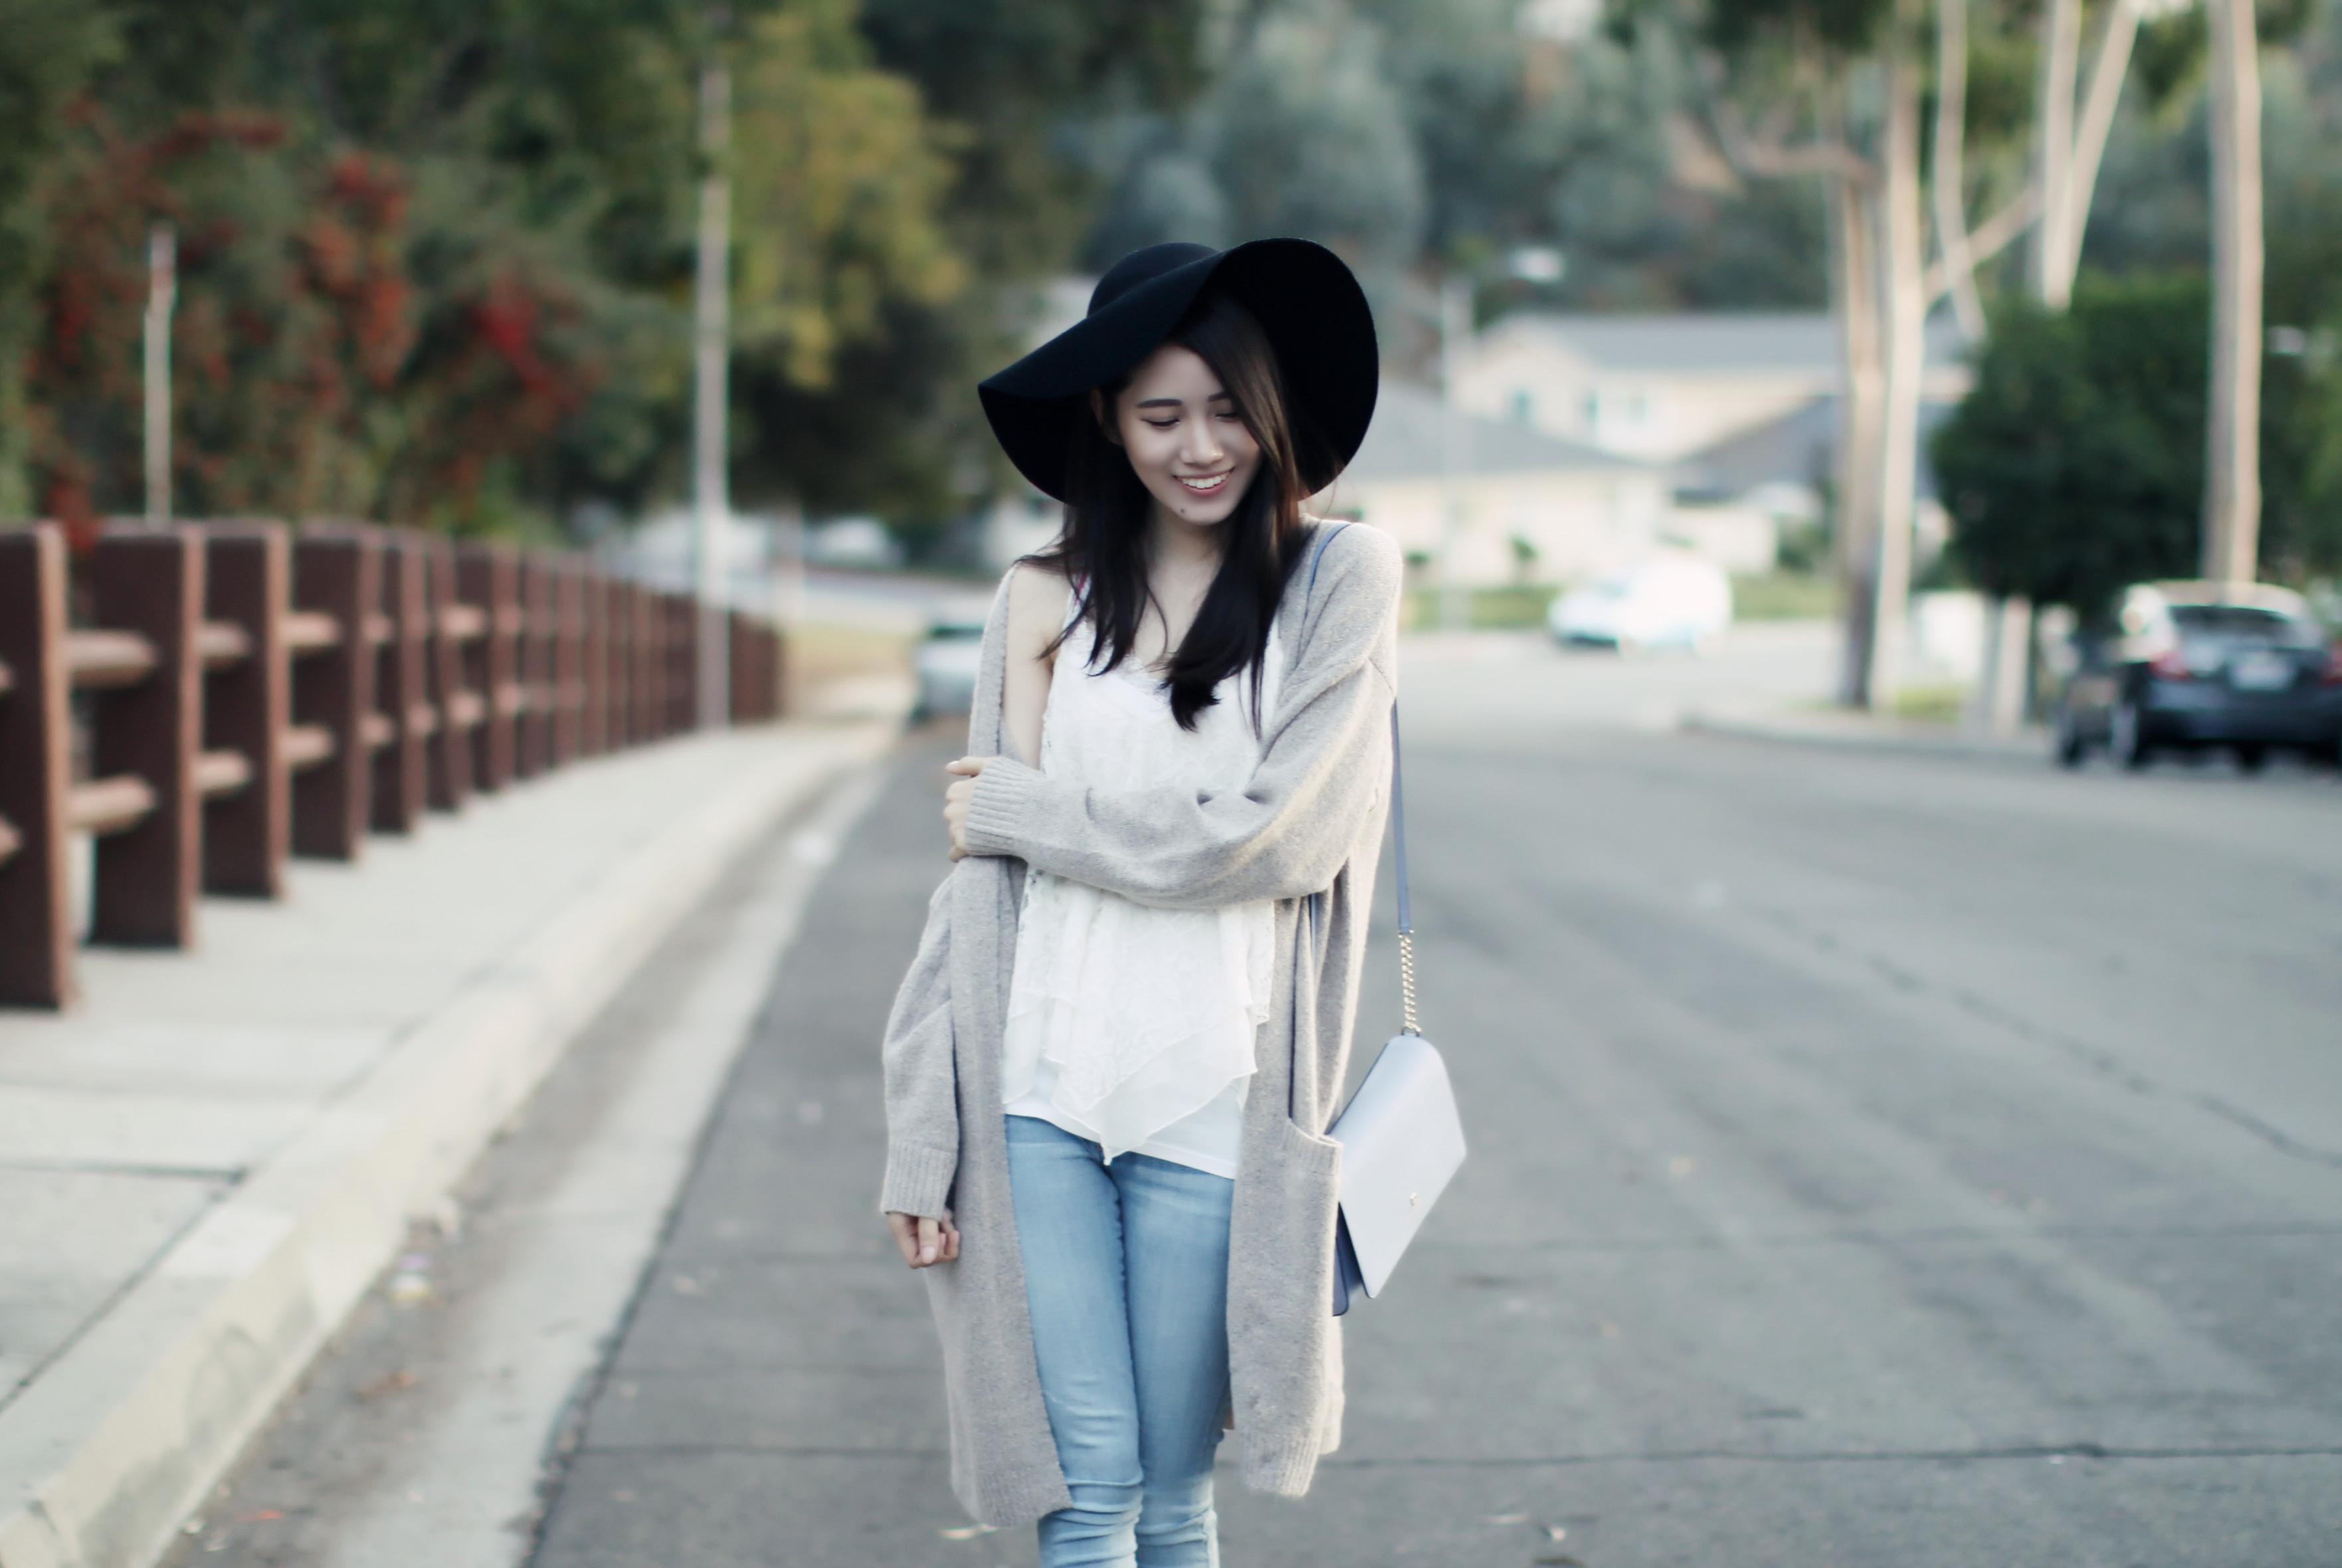 3860-ootd-fashion-style-outfitoftheday-wiwt-nordstrom-abercrombie-bohemian-fallfashion-forever21-f21-f21xme-koreanfashion-elizabeeetht-clothestoyouuu